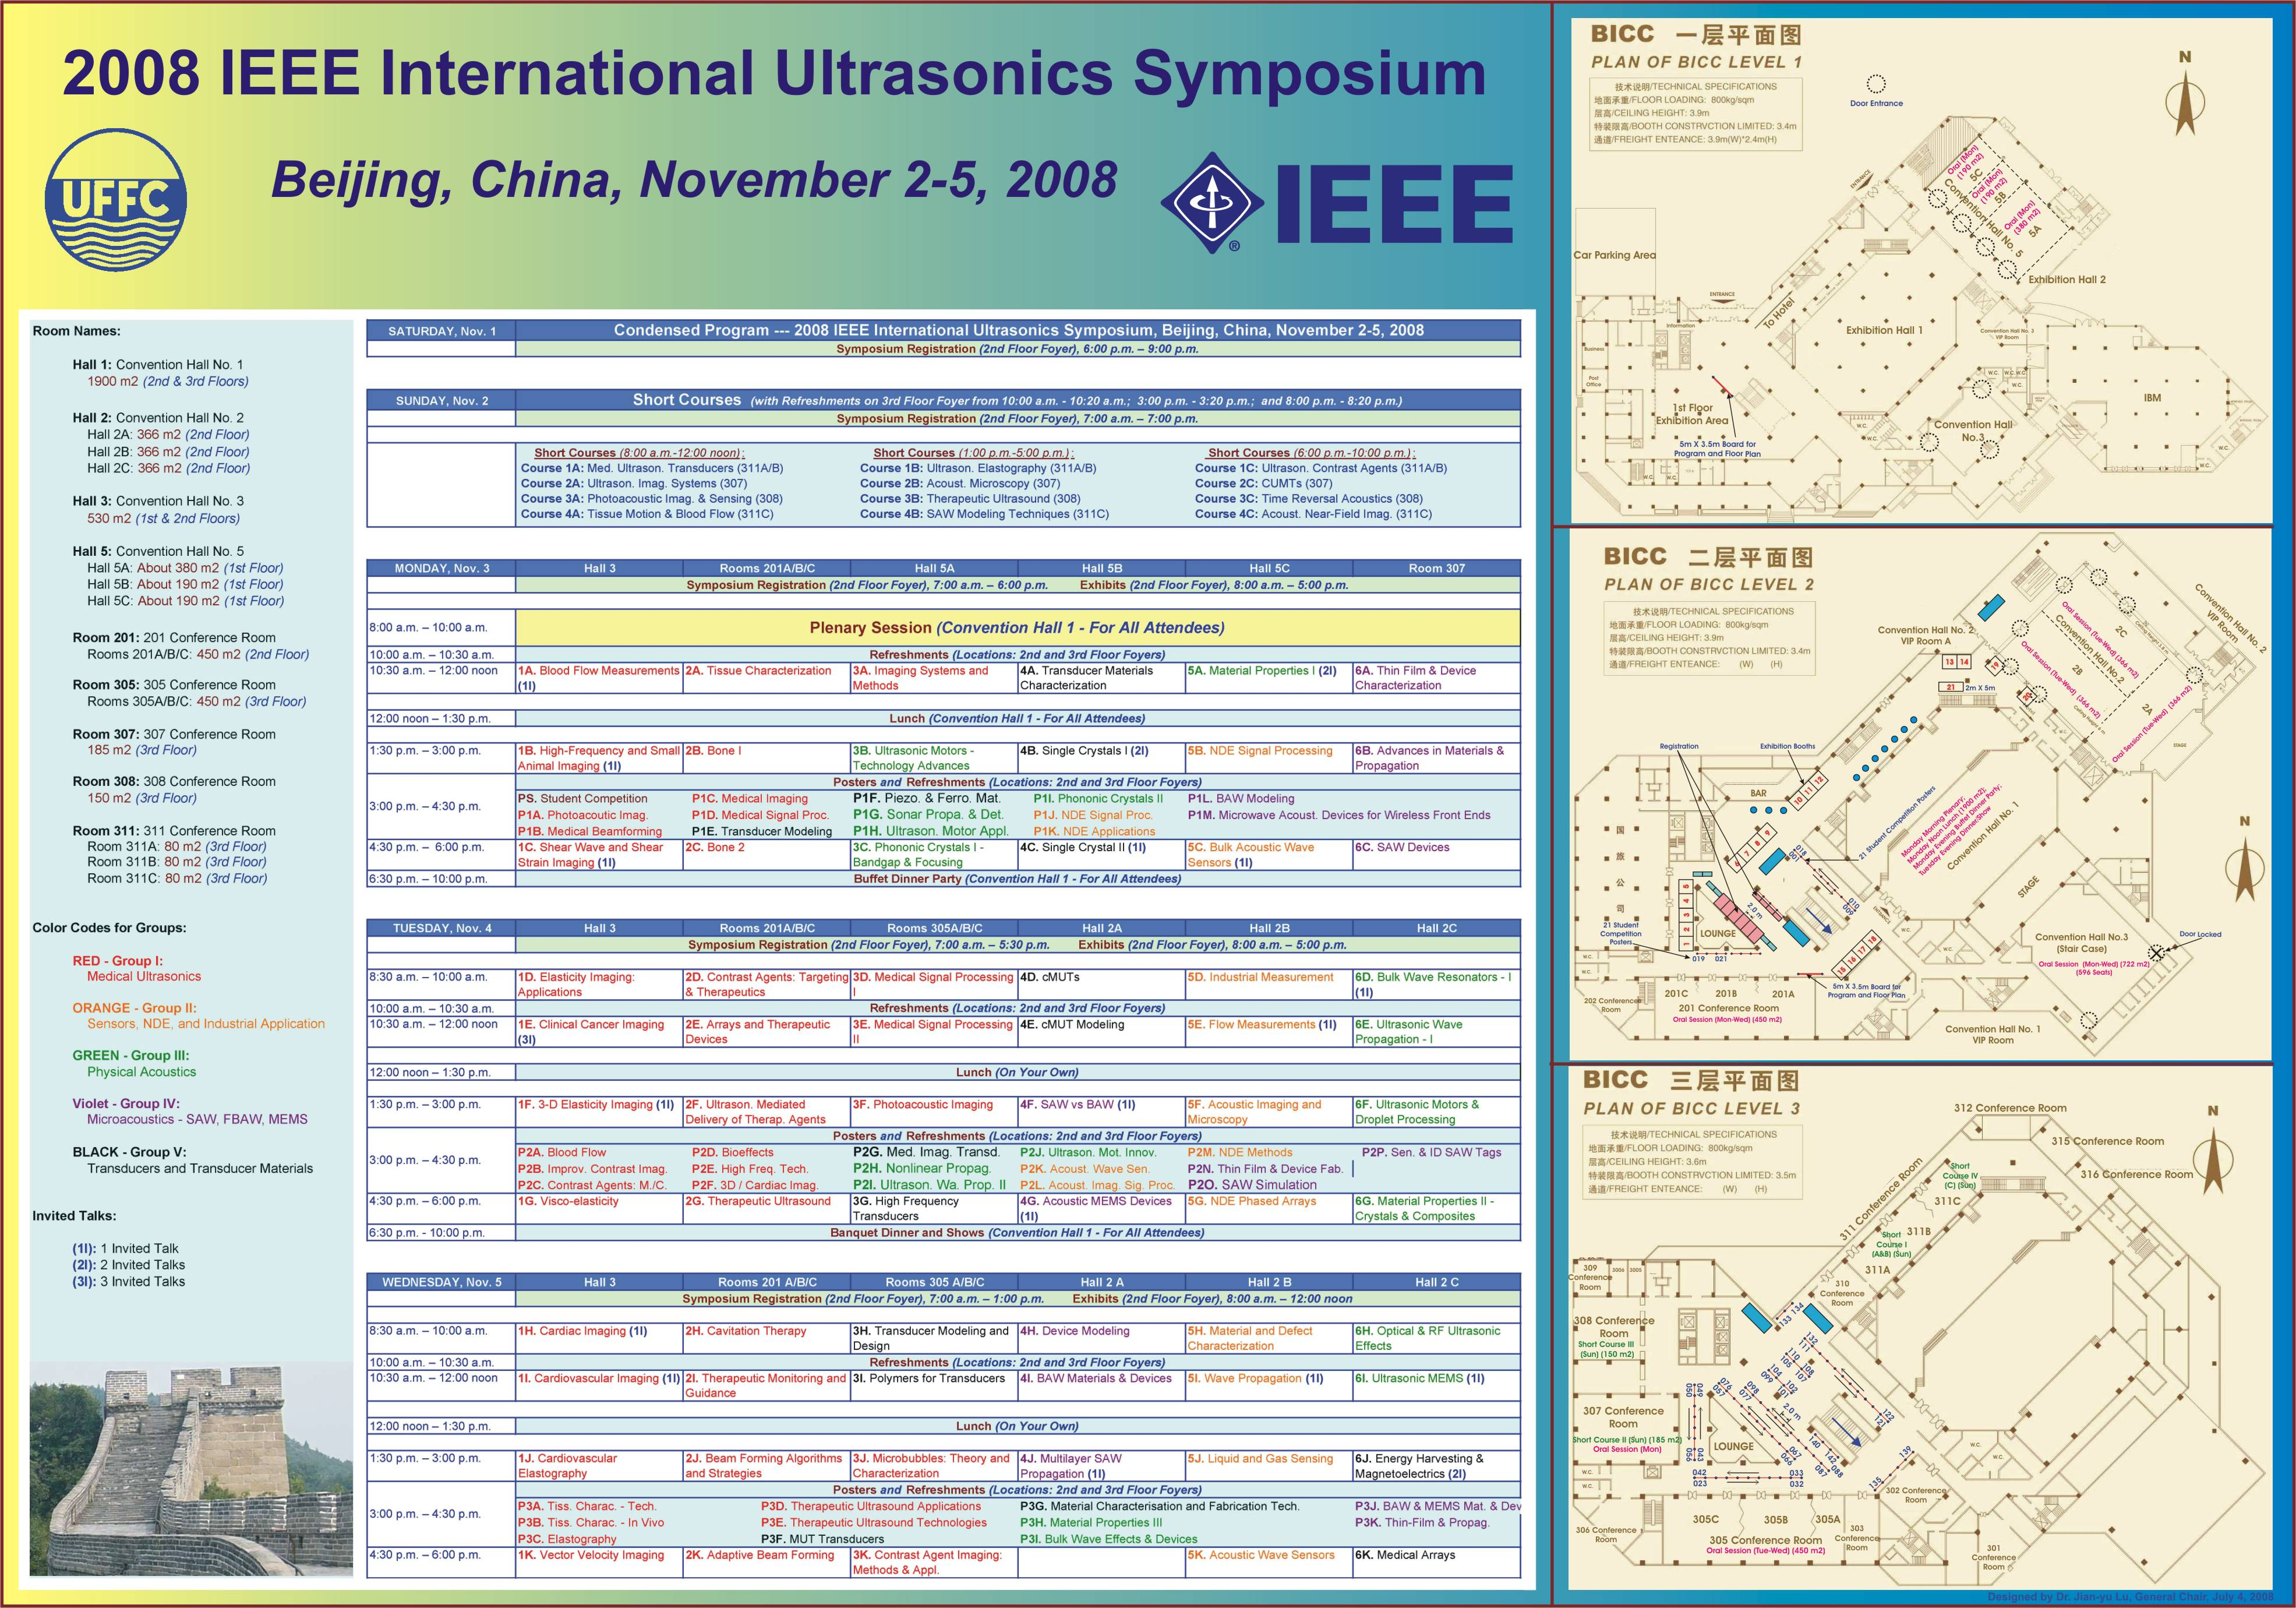 2008 IEEE International Ultrasonics Symposium Beijing China